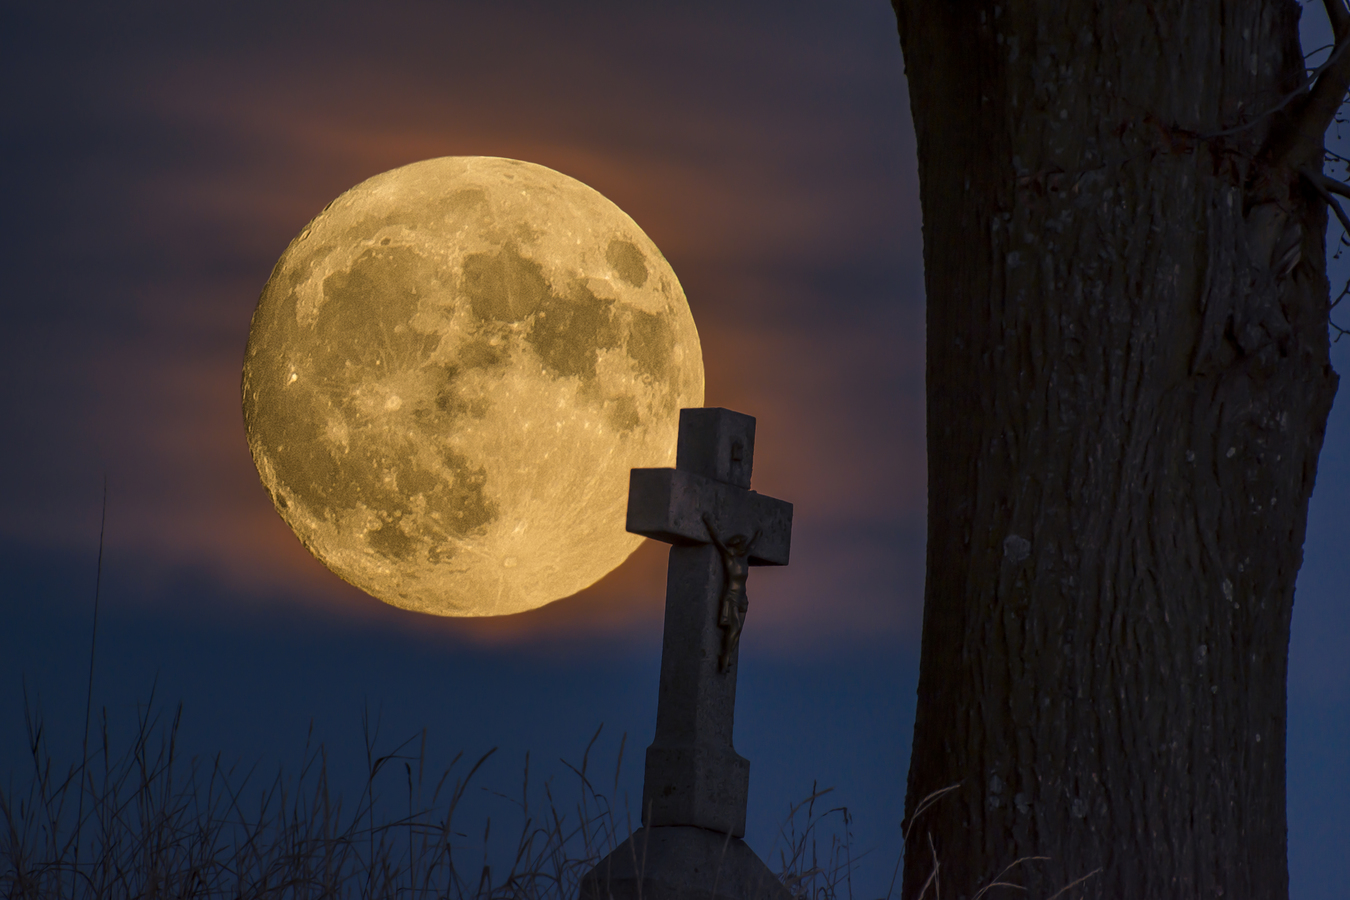 ...Měsíční chodec... Moonwalker